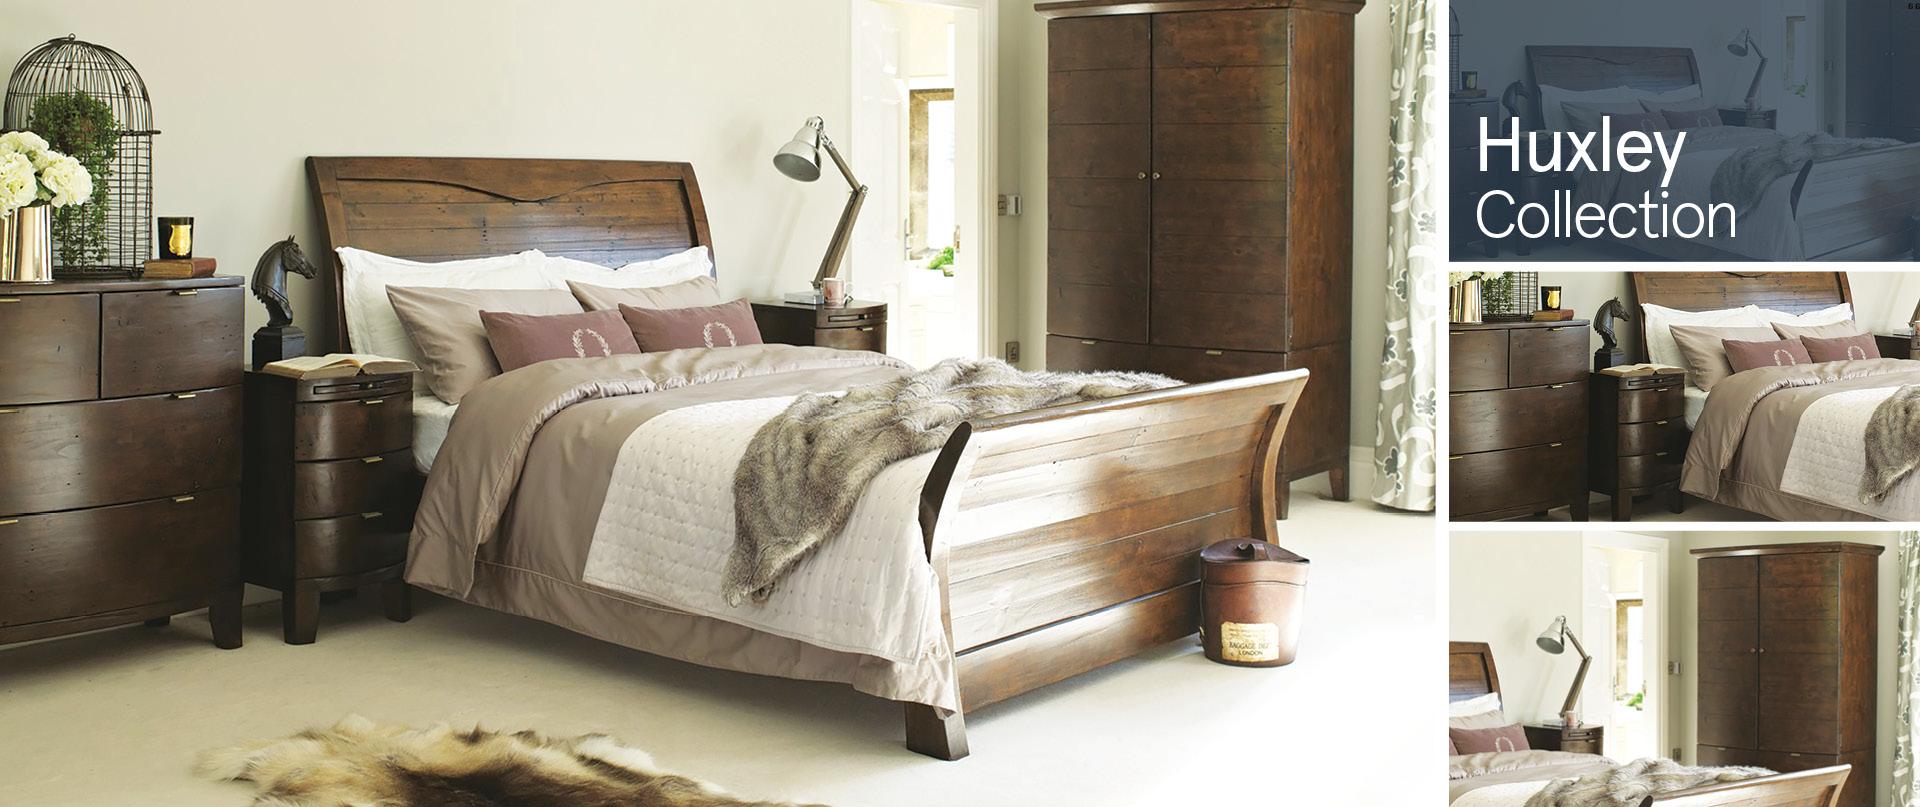 Huxley Bedroom Furniture Ranges